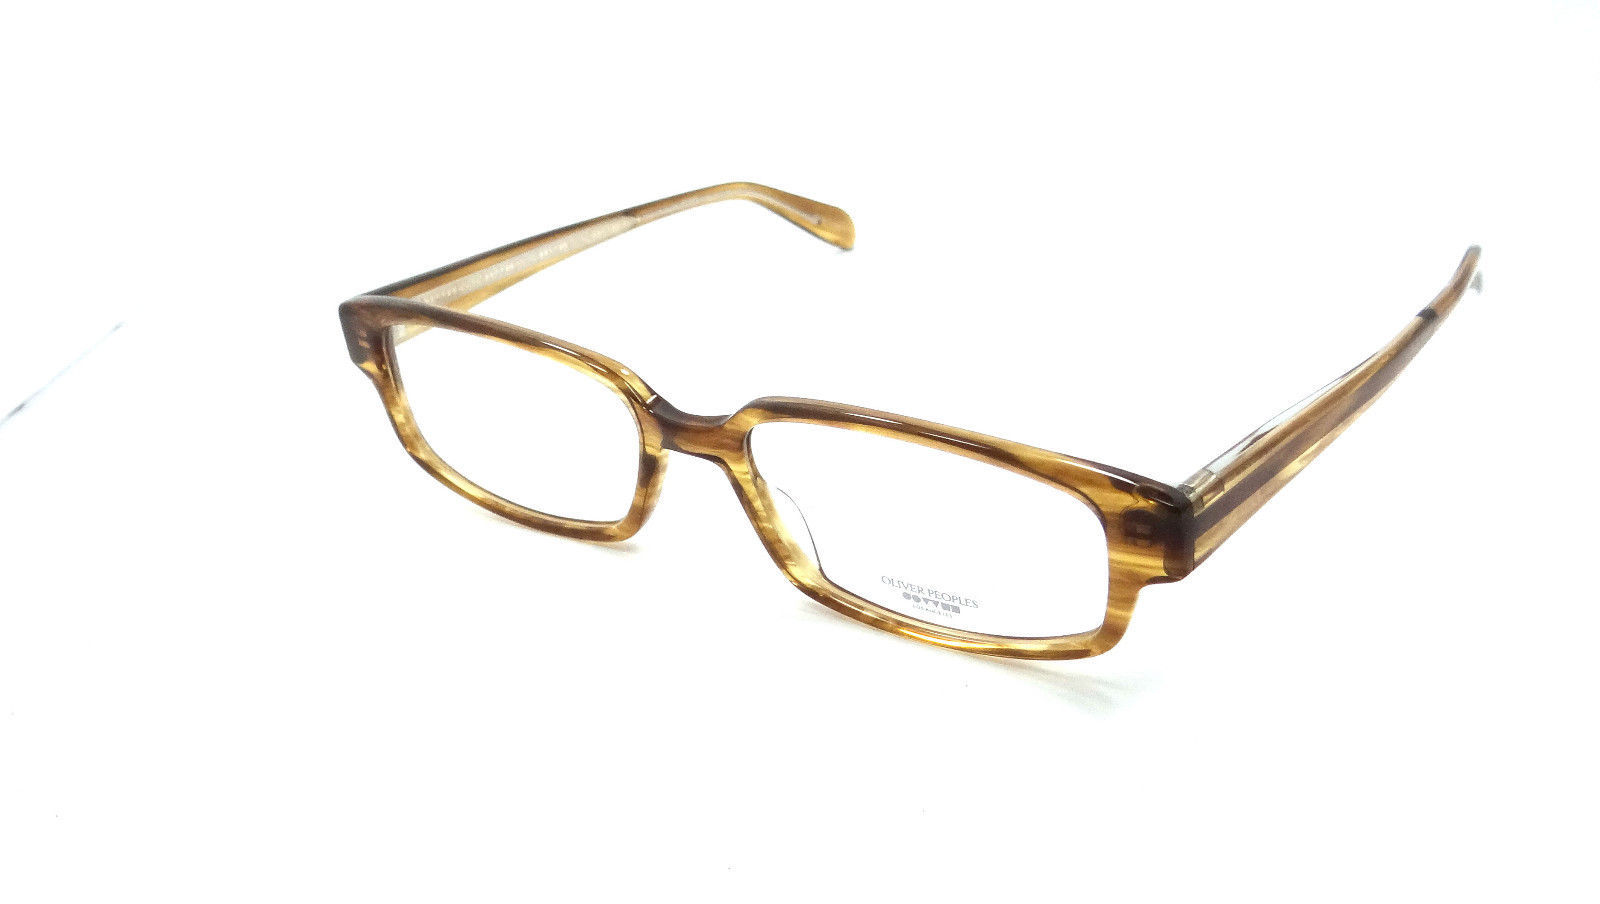 6e84d6f940b Oliver Peoples Rx Eyeglasses Frames Danver and 50 similar items. 57